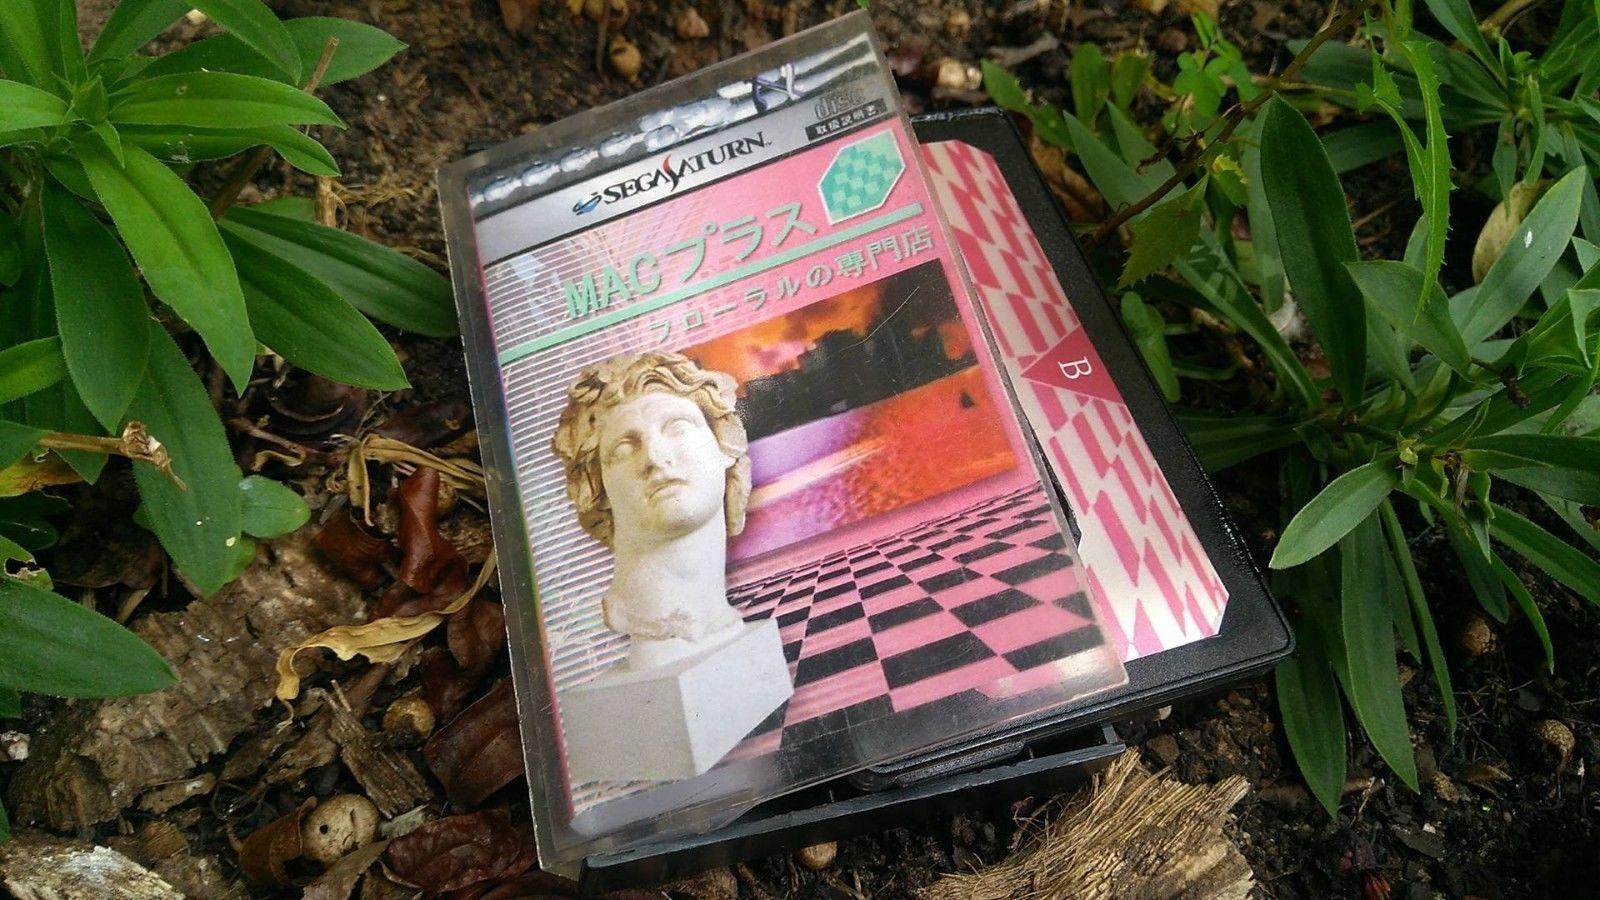 Popsike Com Macintosh Plus Floral Shoppe Cassette Bootleg